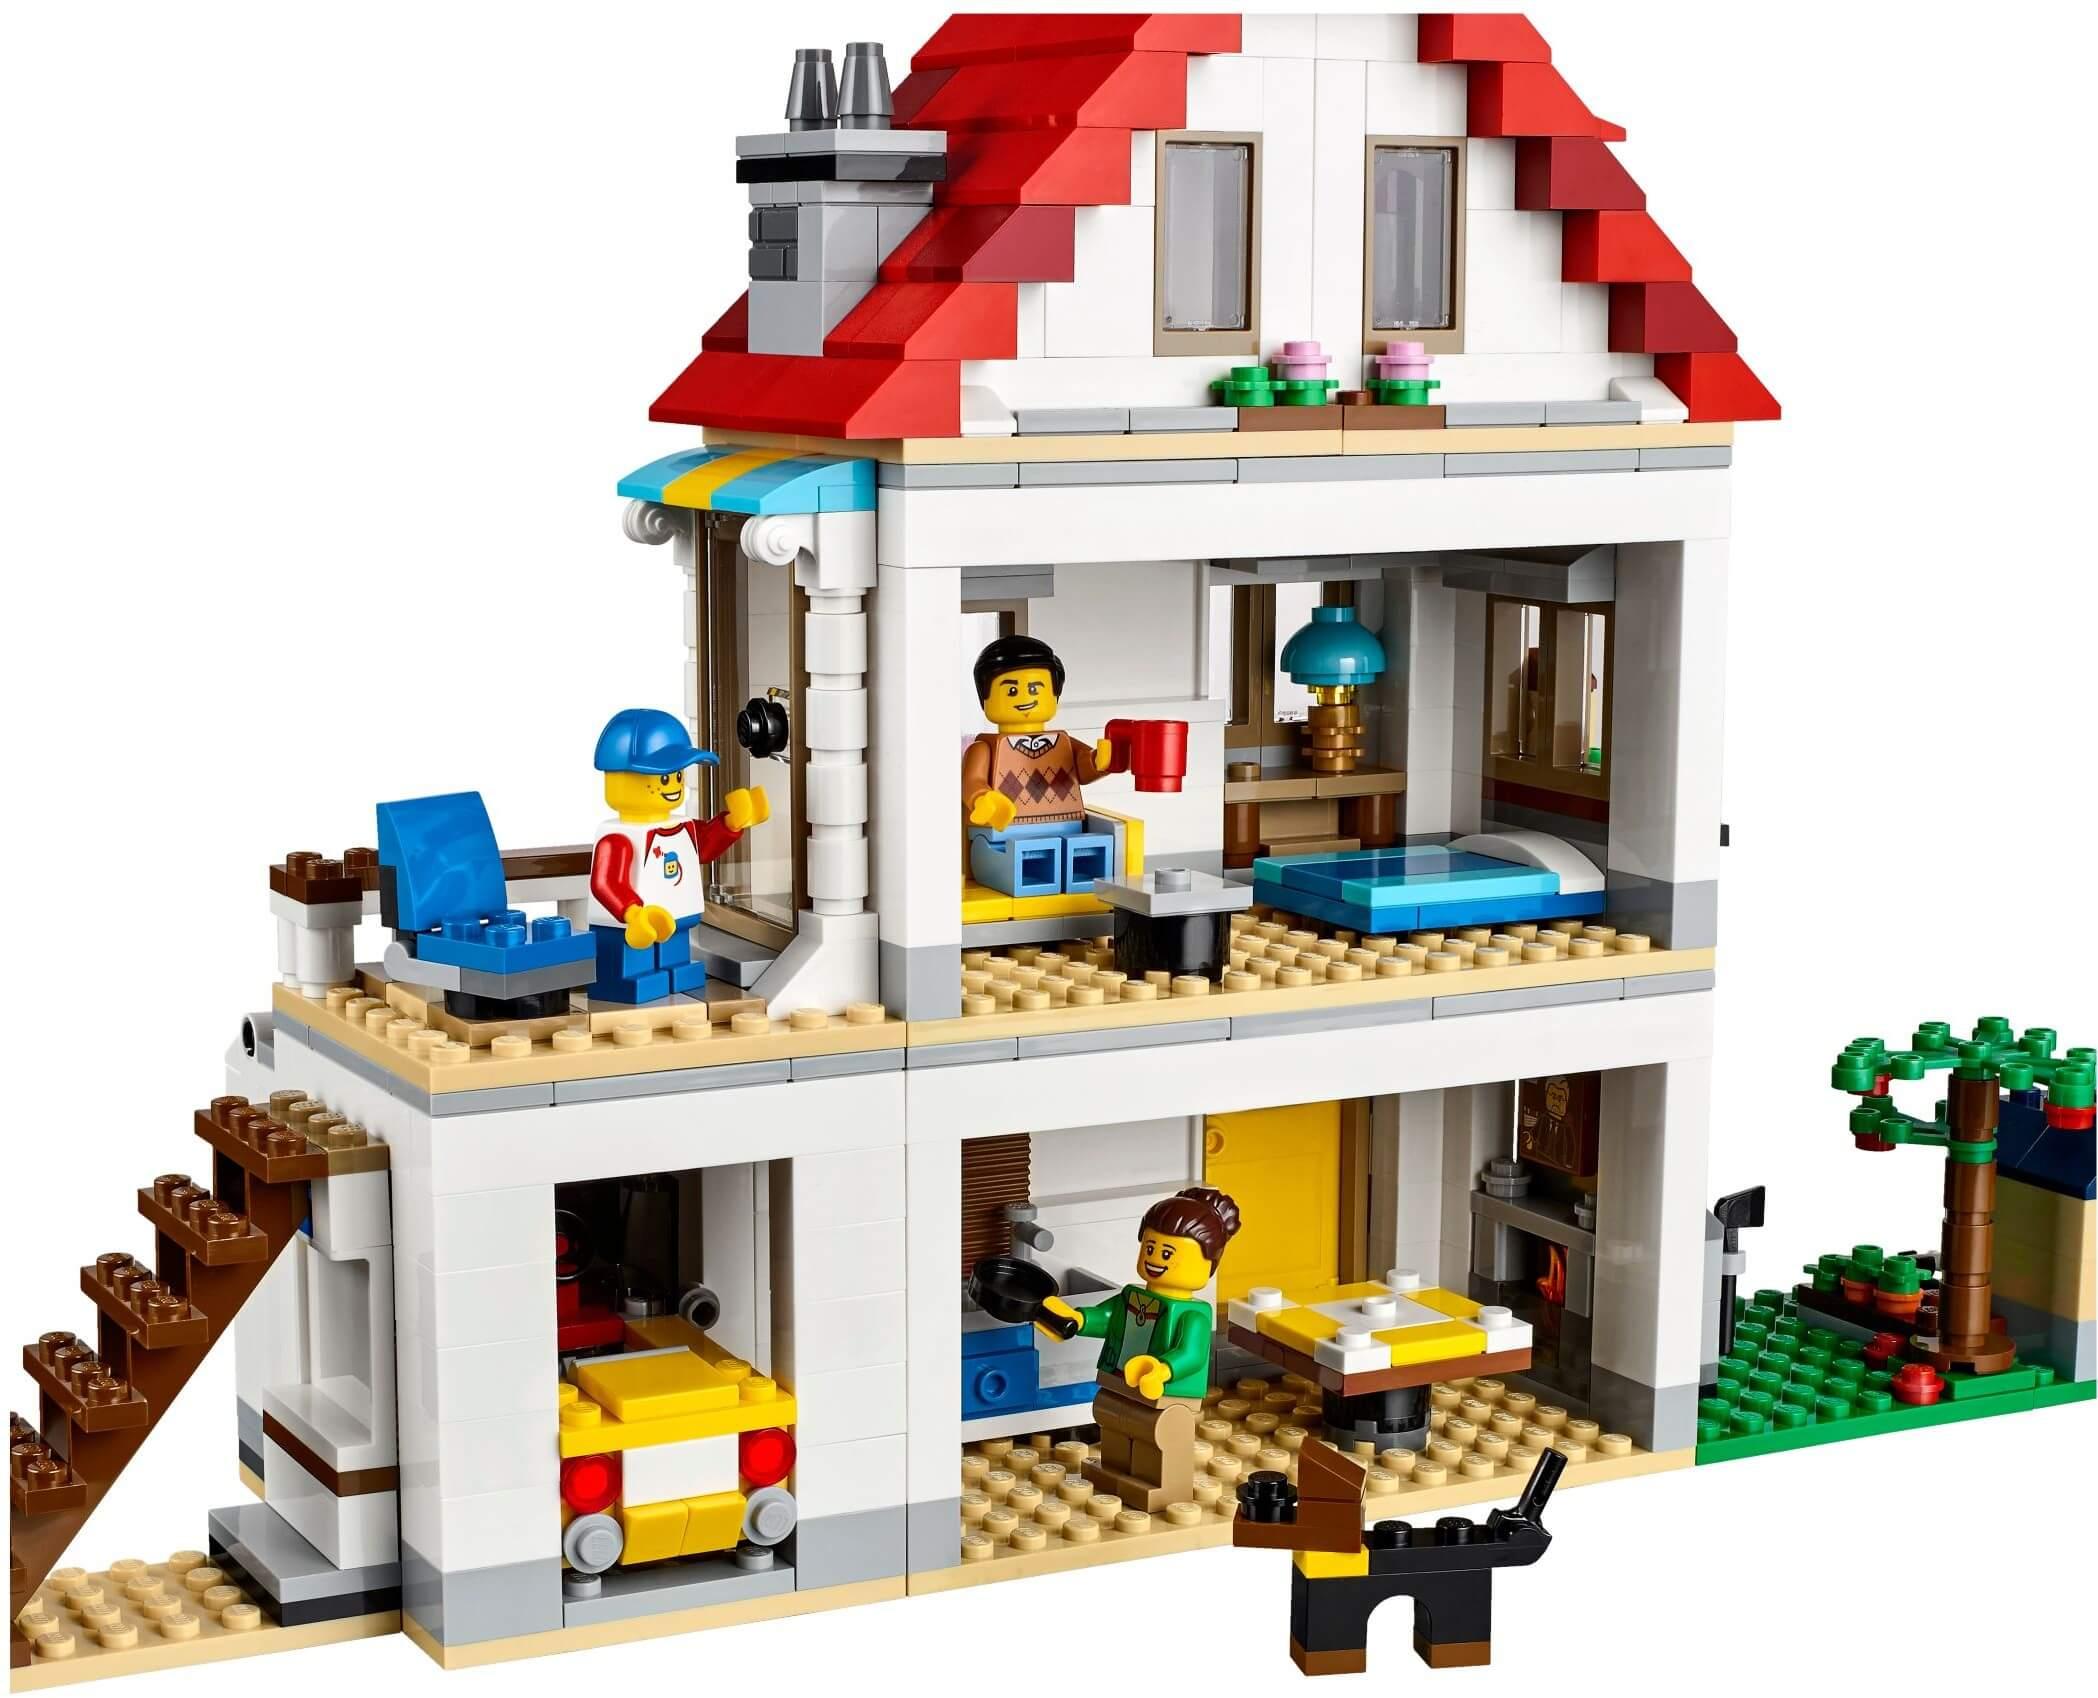 Mua đồ chơi LEGO 31069 - LEGO Creator 31069 - Biệt Thự Gia Đình 3-trong-1 (LEGO Creator Modular Family Villa)